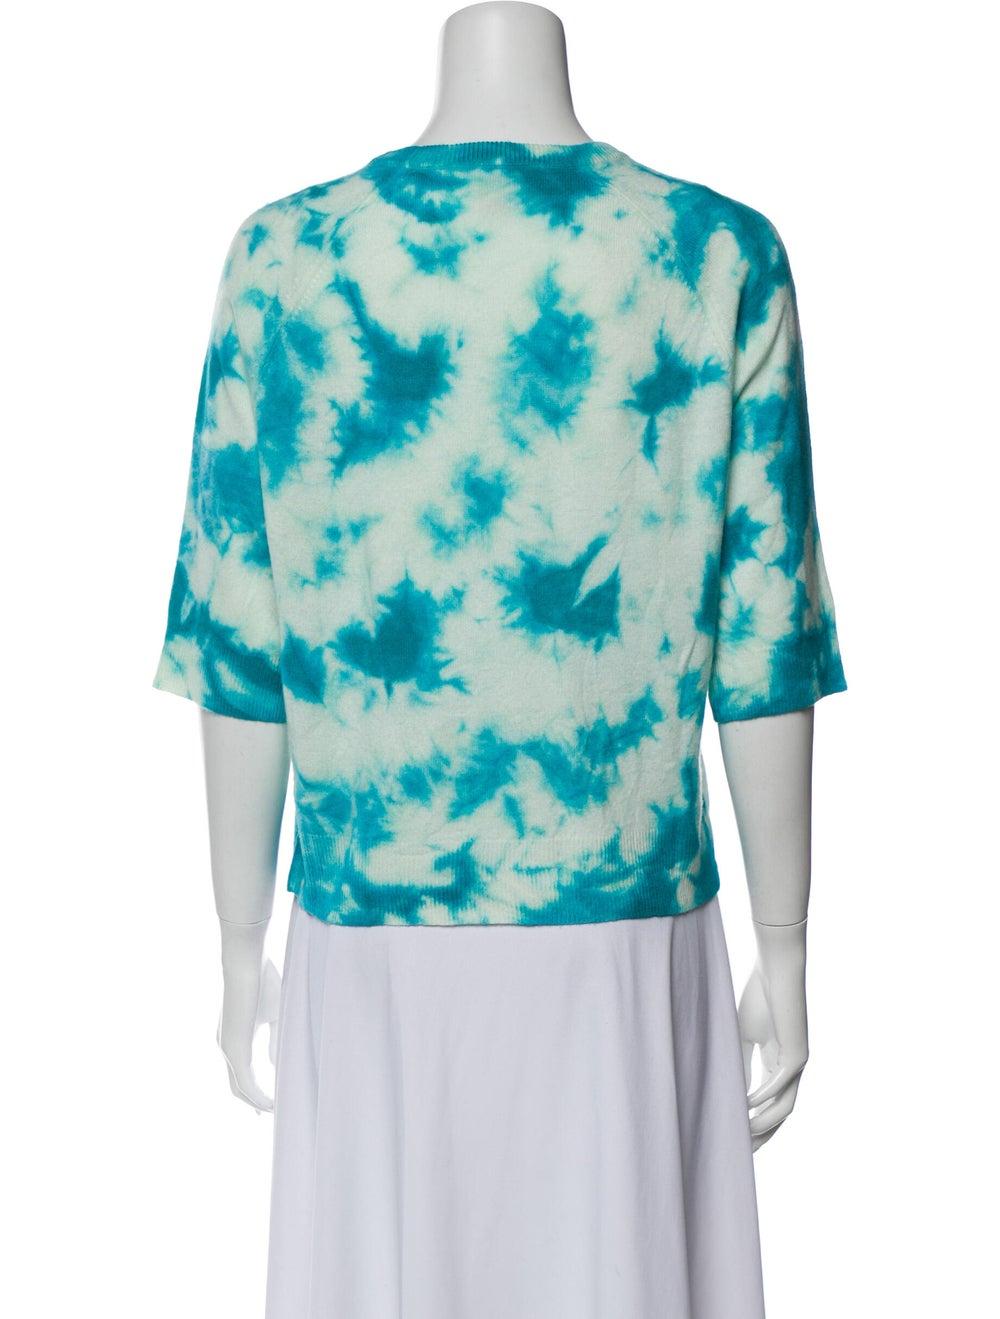 Michael Kors Cashmere Tie-Dye Print Sweater Blue - image 3